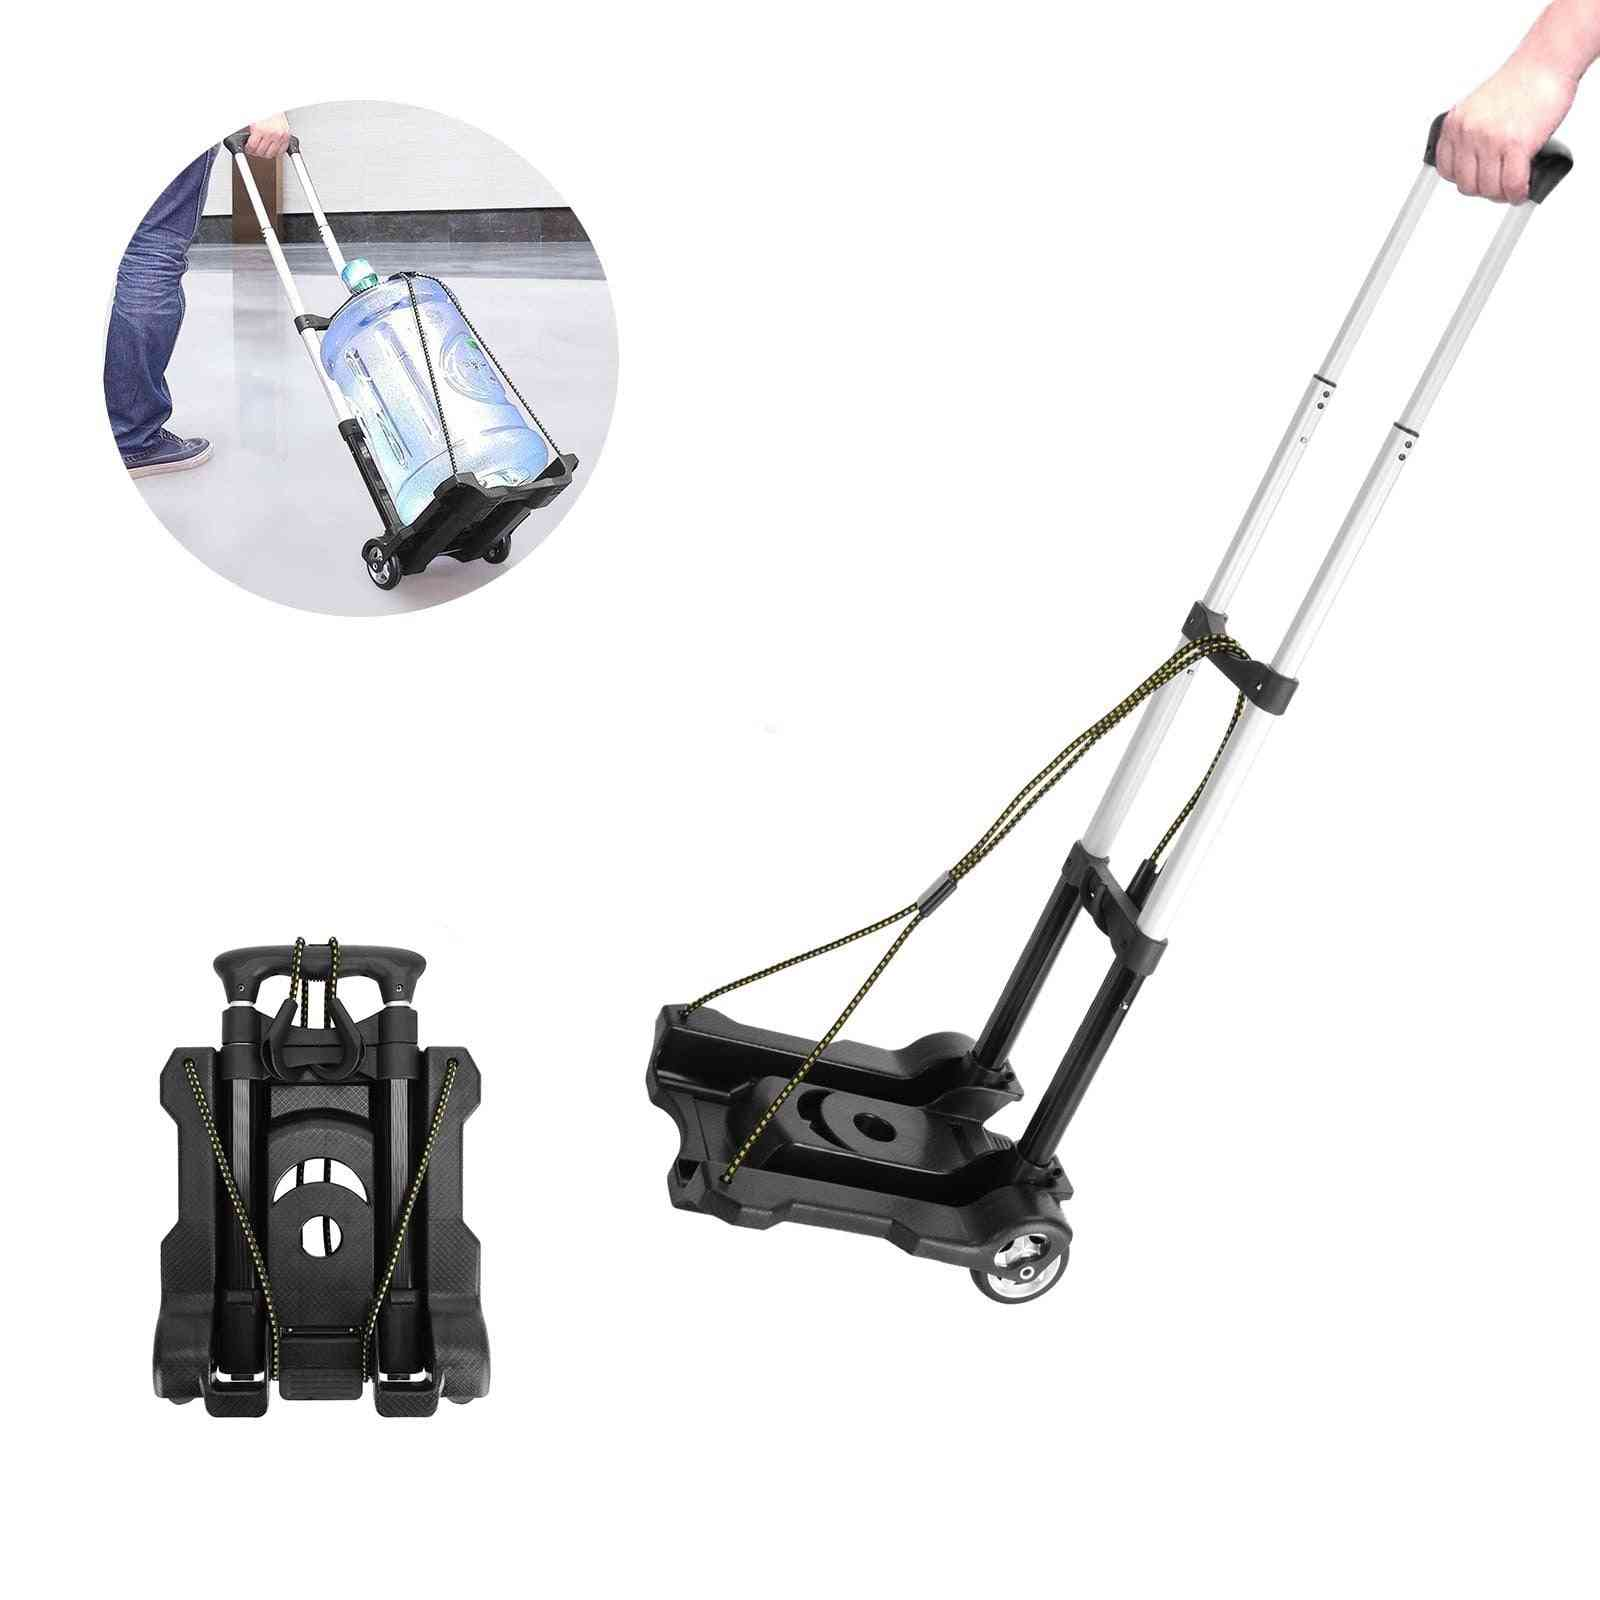 Foldable Folding Trolley, Aluminum&plastic Lightweight Travel, Shopping